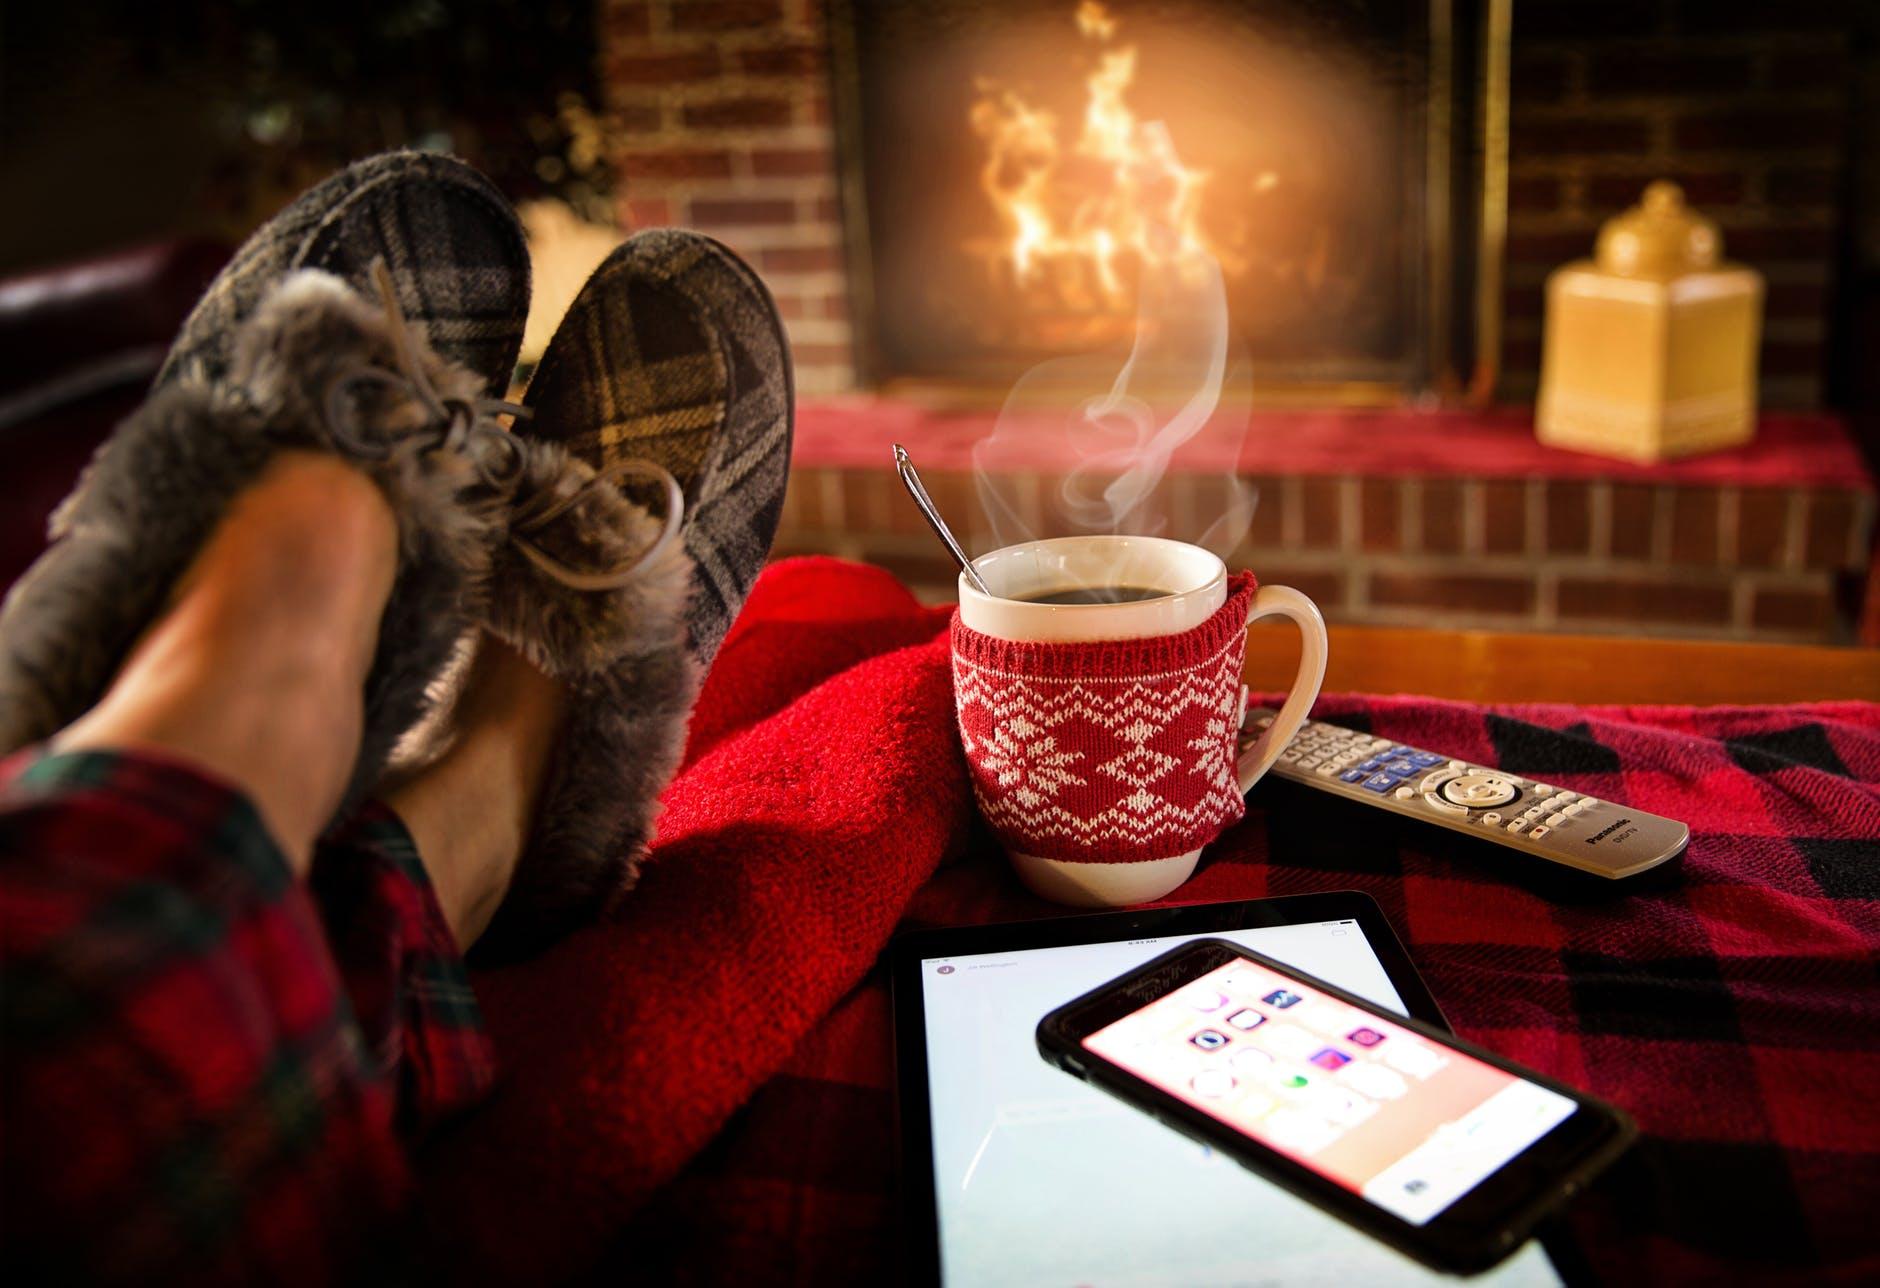 save money on utility bills - adult beverage breakfast celebration